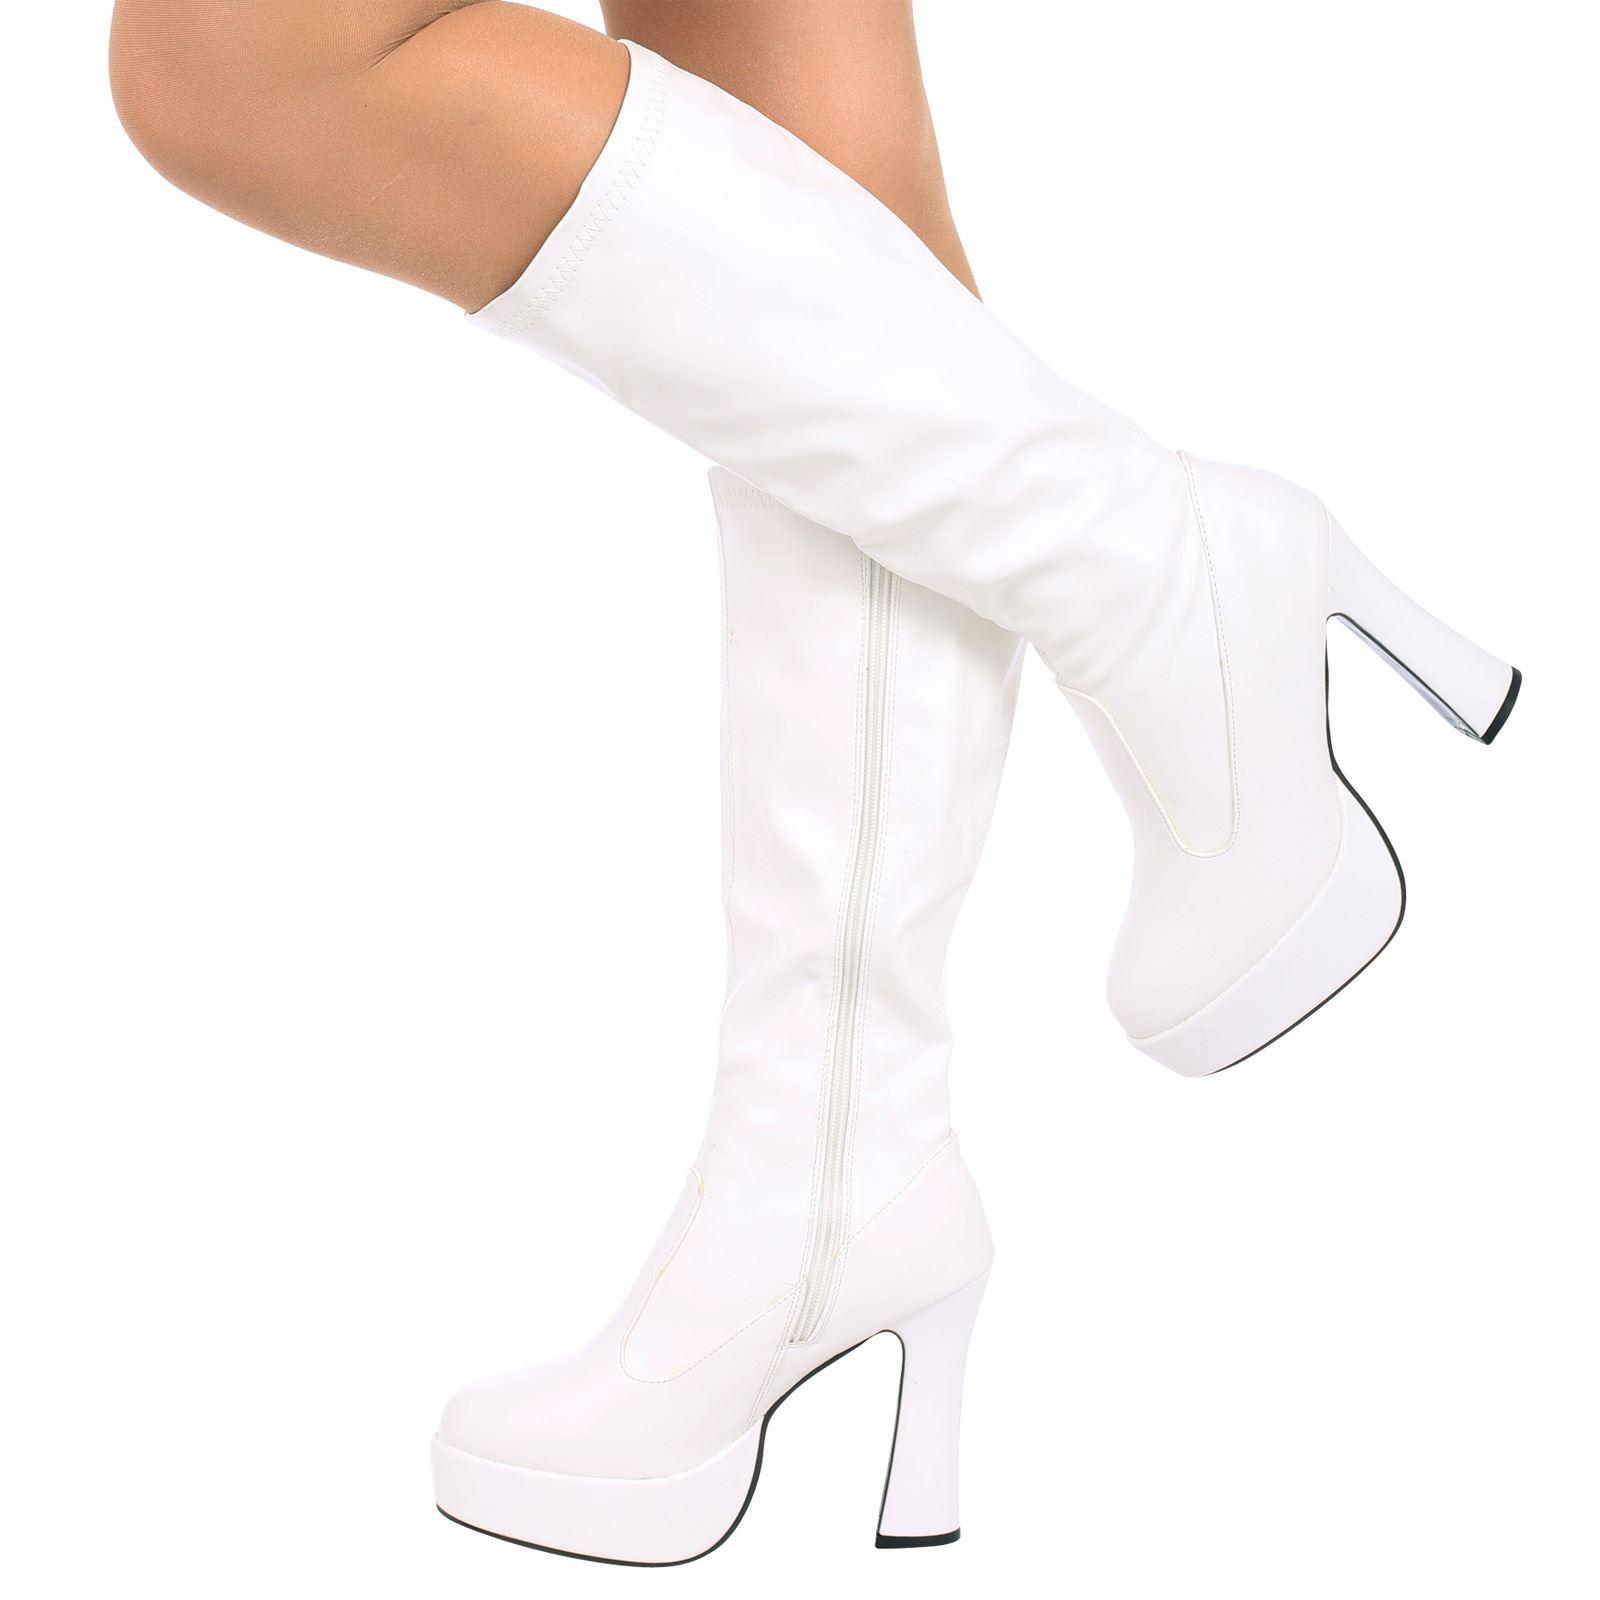 a1fa8b7d3e6 WOMENS LADIES FANCY DRESS 60s 70s PLATFORM RETRO GOGO BOOTS KNEE ...